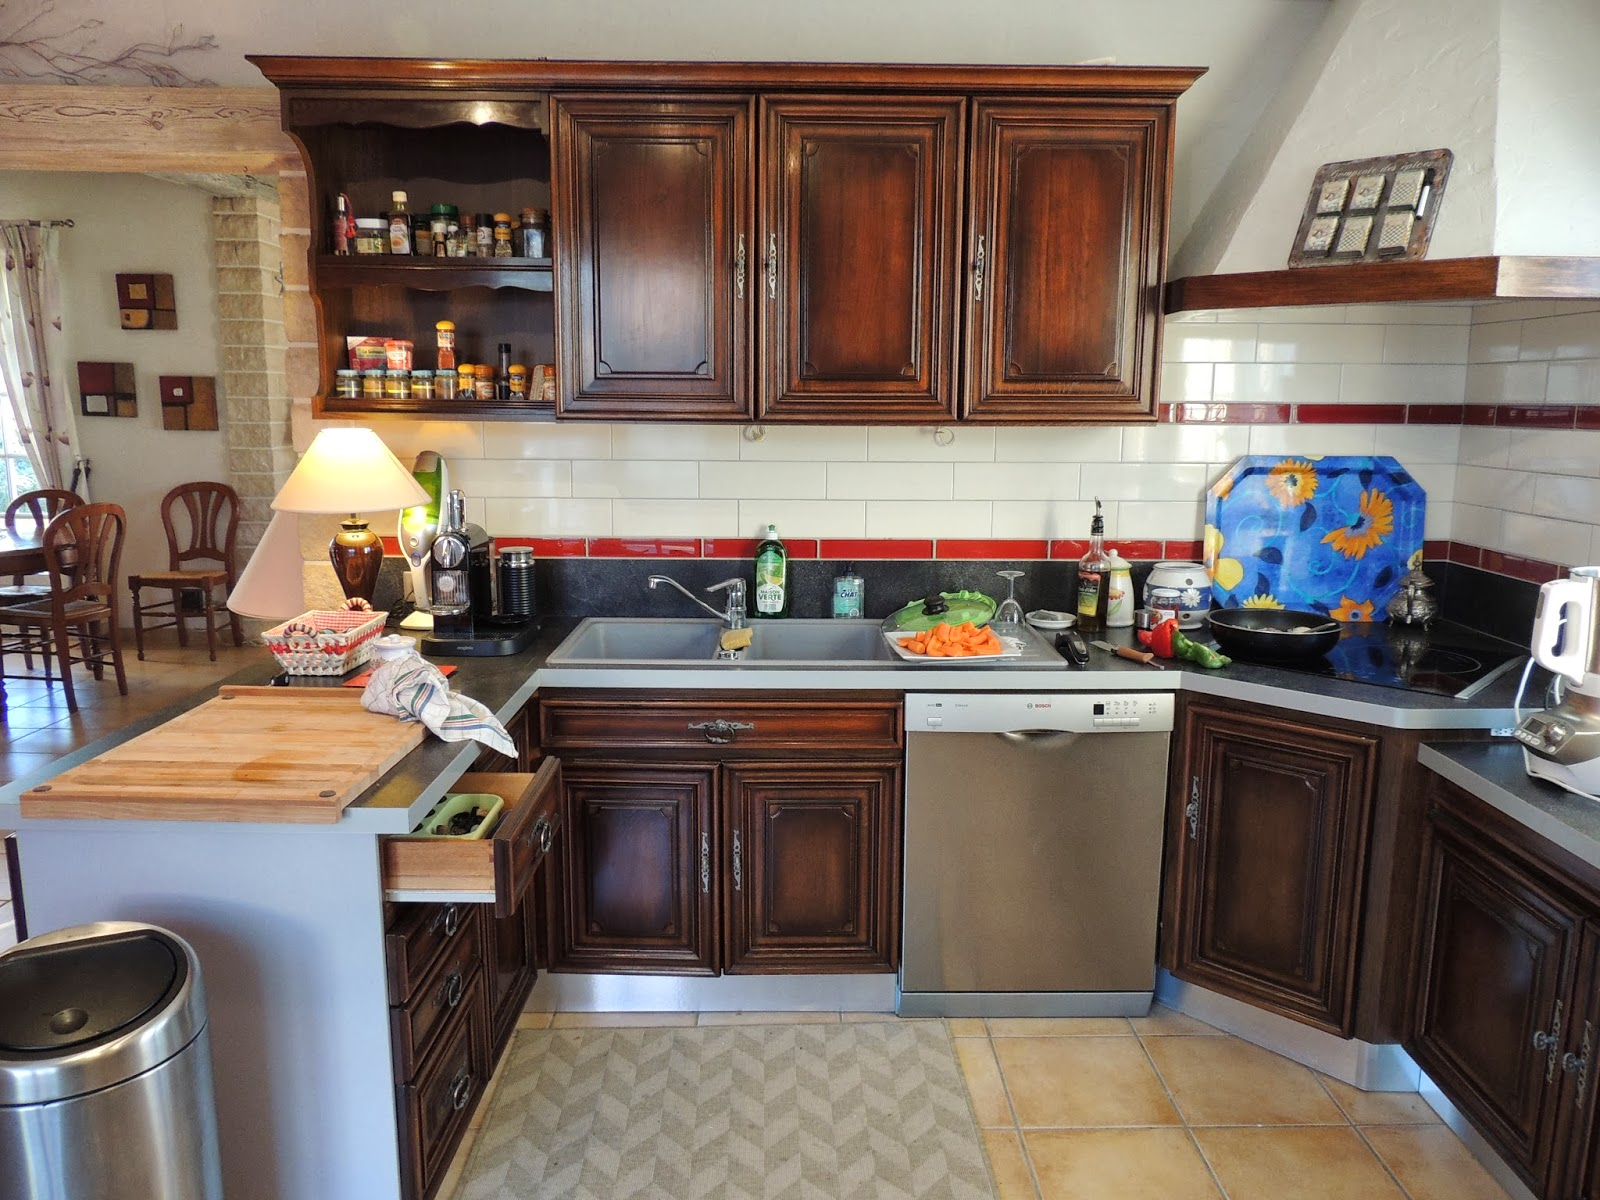 L 39 atelier d 39 emmanuelle relooking d 39 une cuisine en ch ne for Relooking cuisine chene